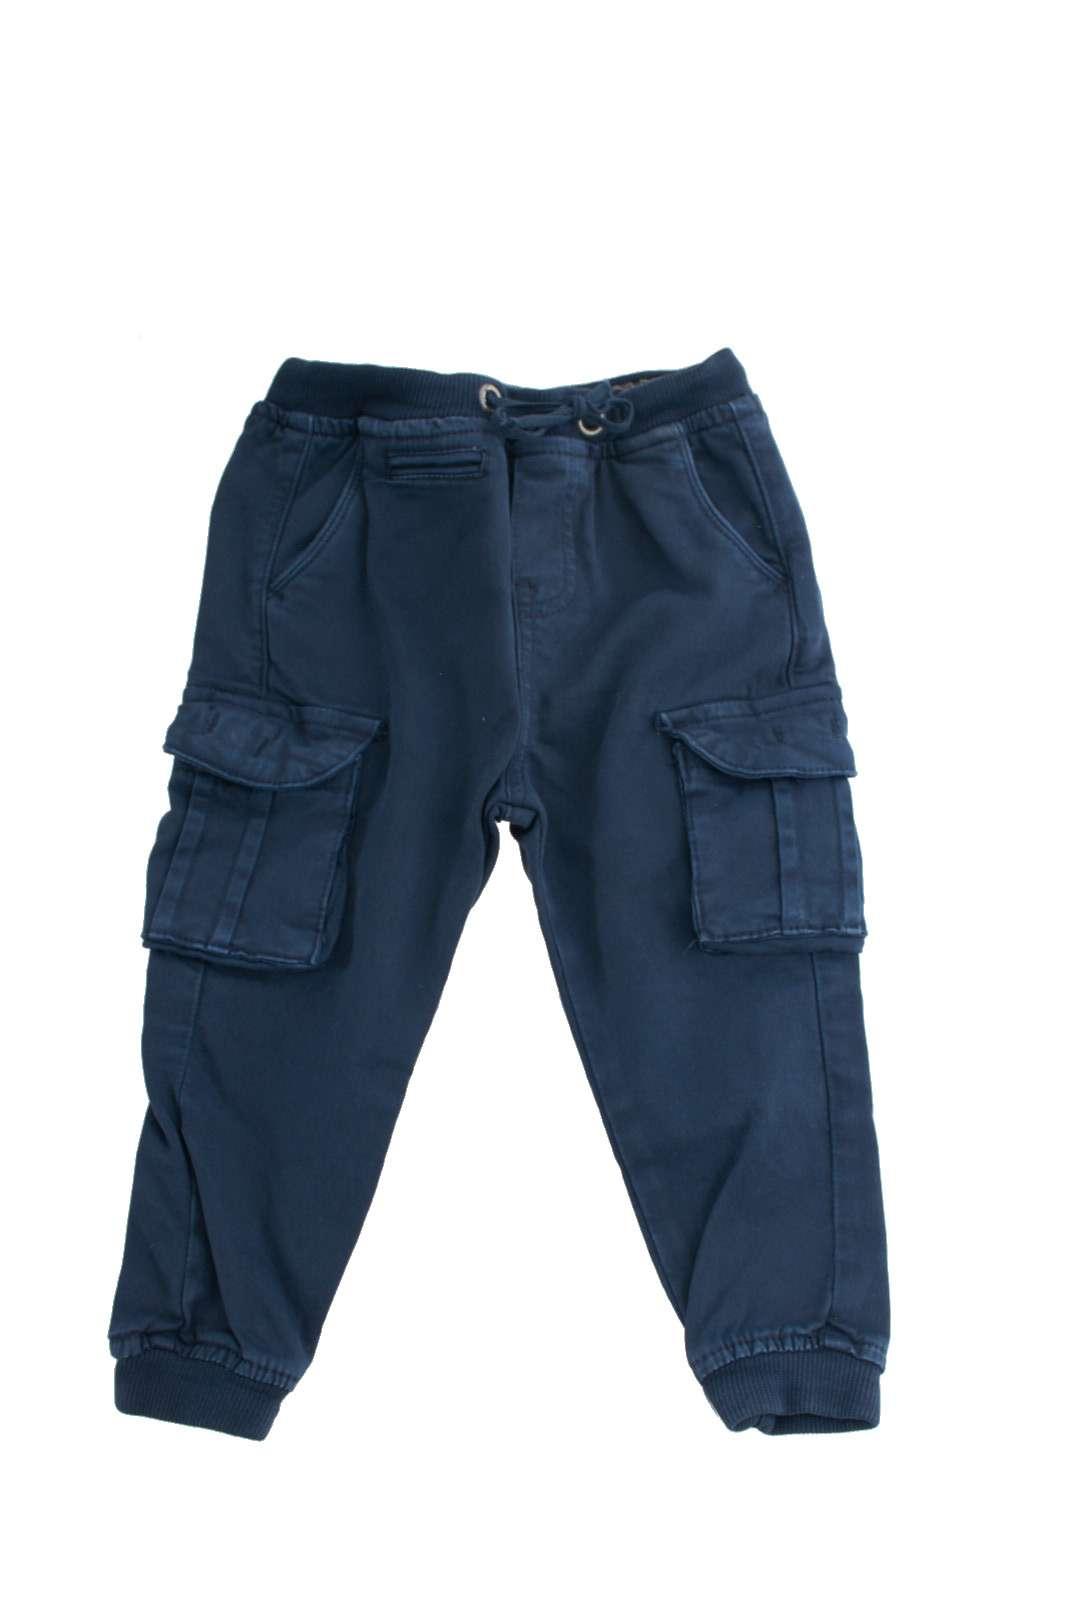 https://www.parmax.com/media/catalog/product/a/i/PE-outlet_parmax-pantaloni-bambino-SP1-19022020-A.jpg